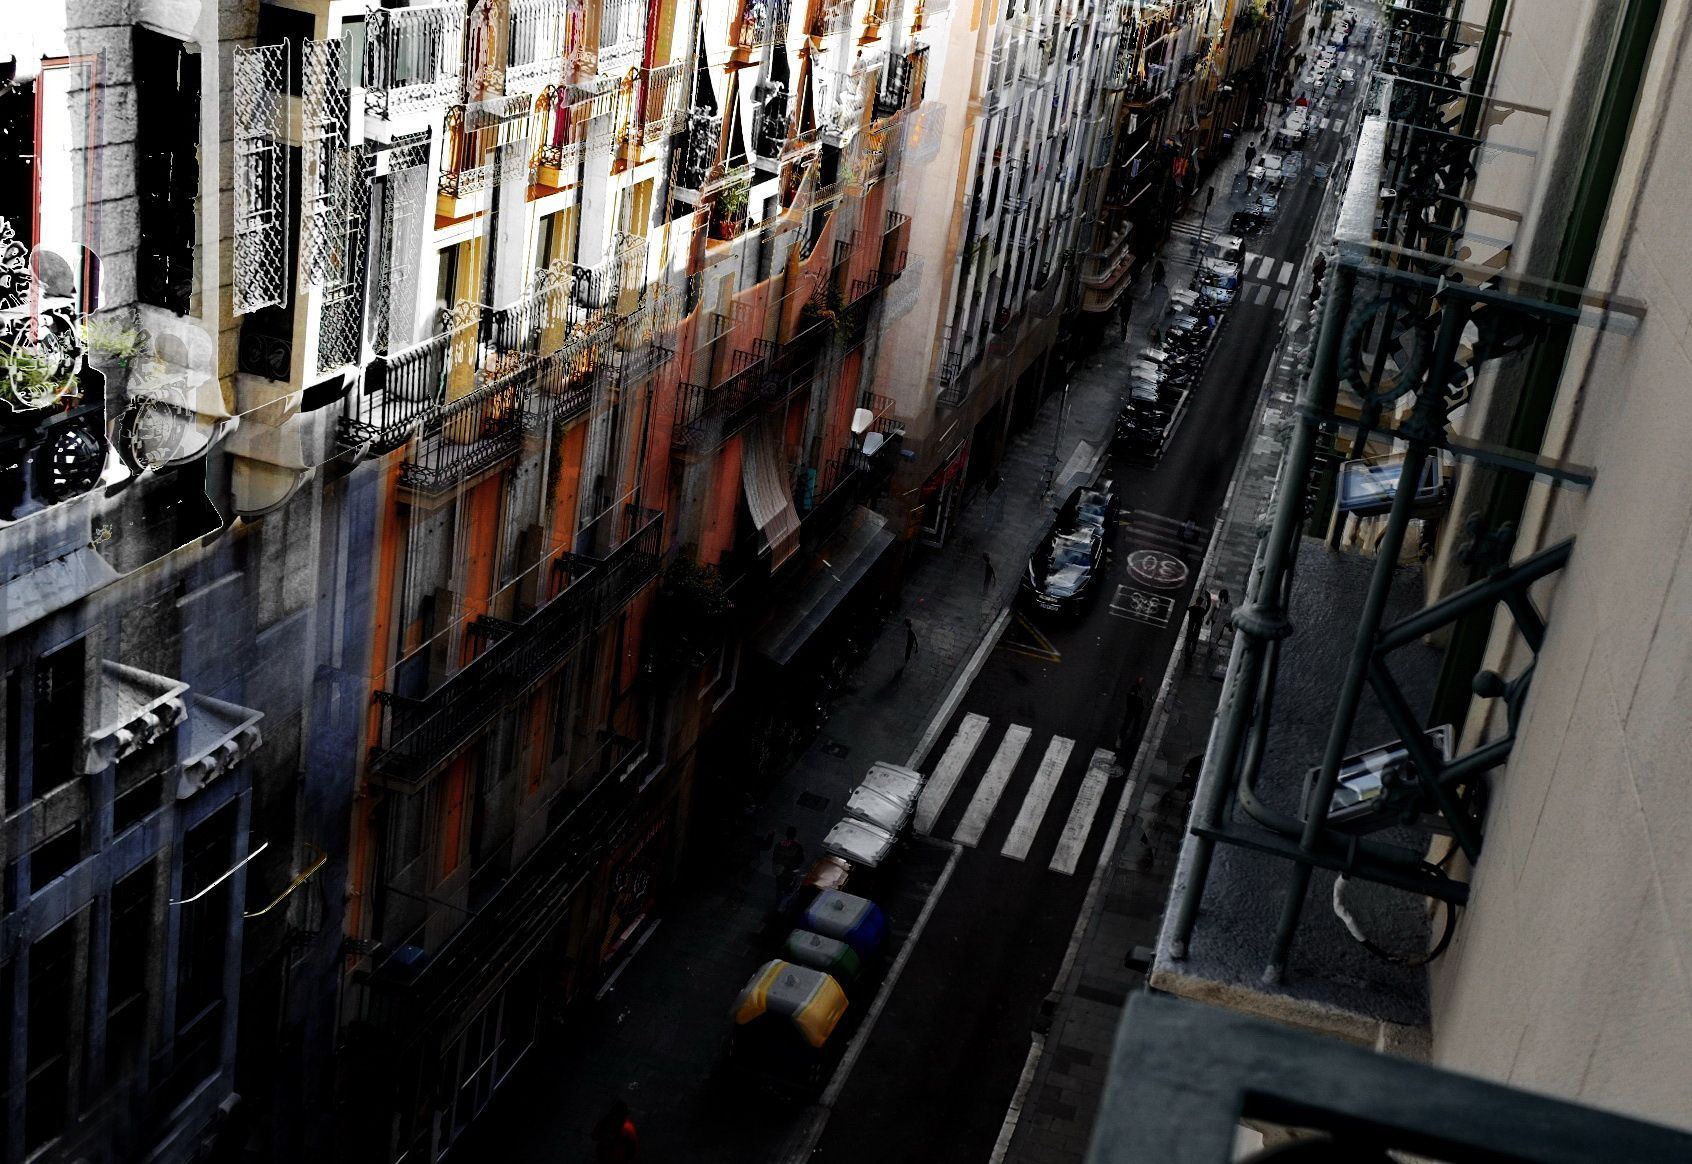 Urban Exploration: CATALAN by arnonar https://t.co/PXfFnrmCpE | #500px #photography #photos https://t.co/MIMs6iJanE #followme #photography